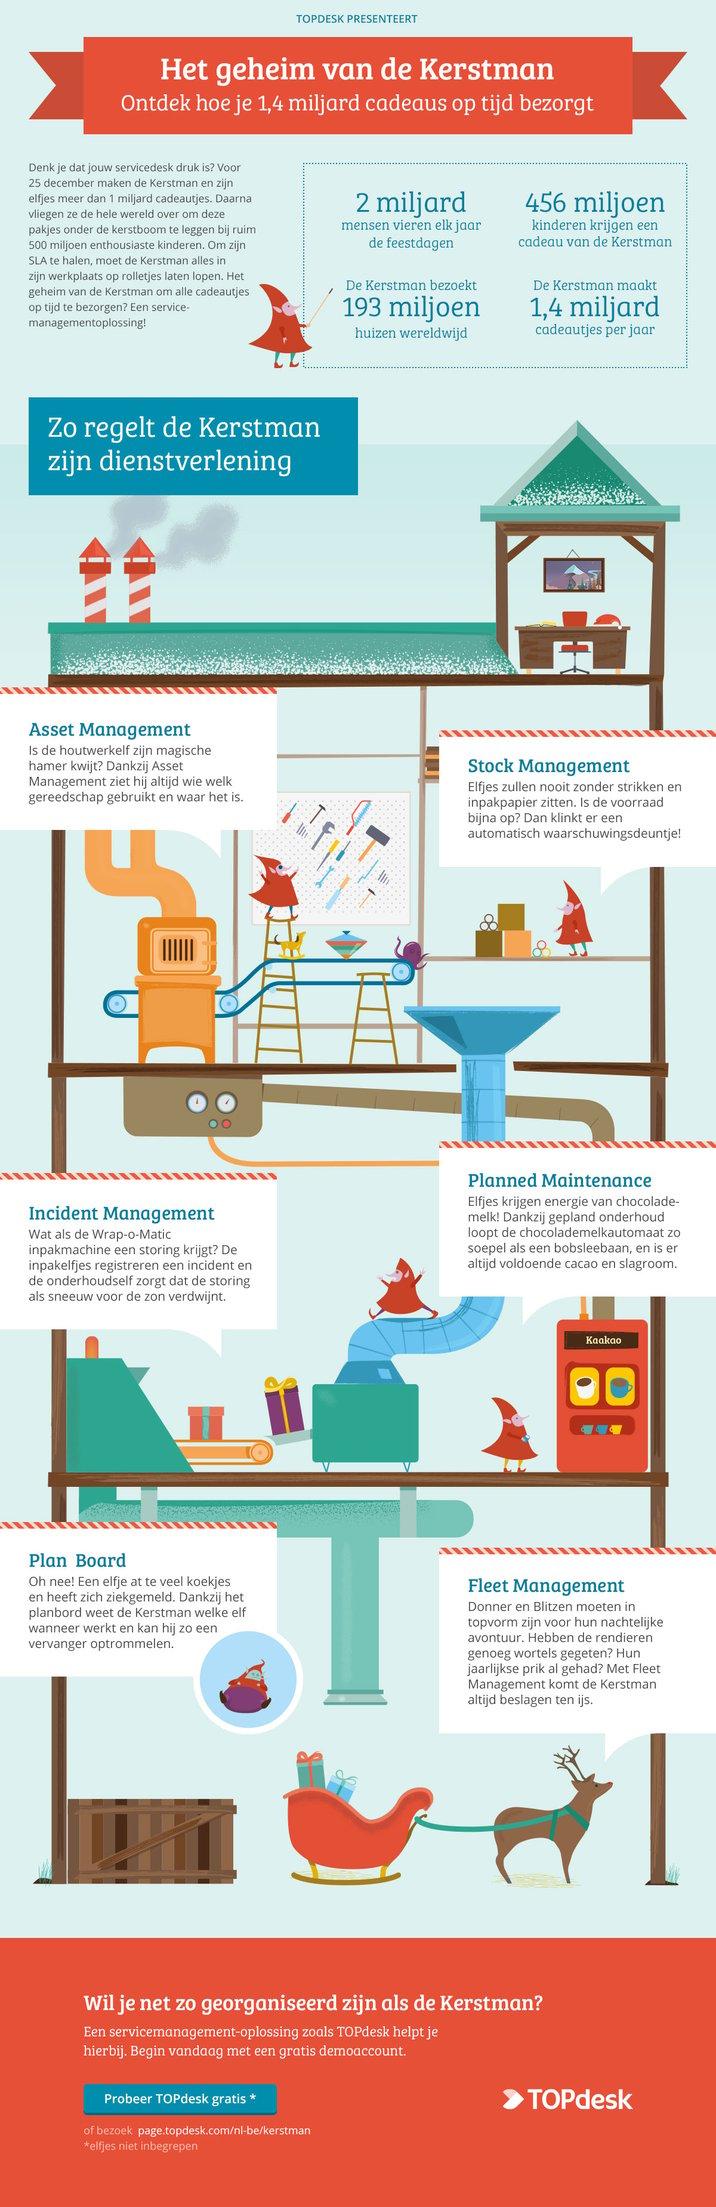 Kerst service management infographic